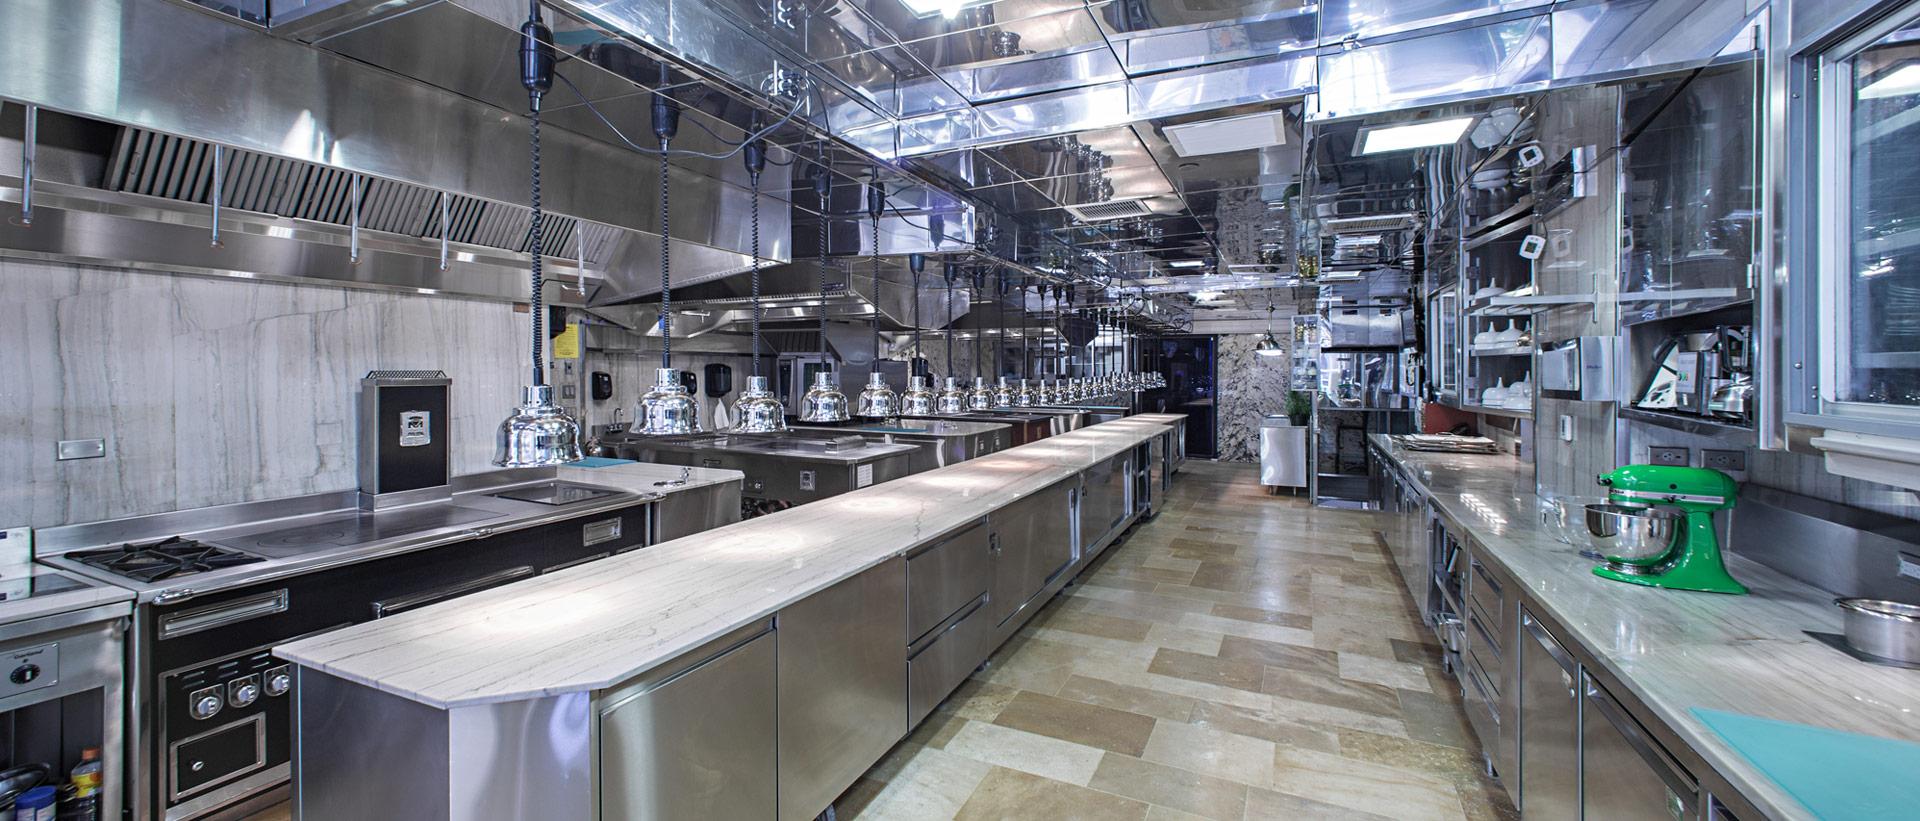 100 Kitchen Design Restaurant Small Kitchen In A Restaurant Stock Photography Image